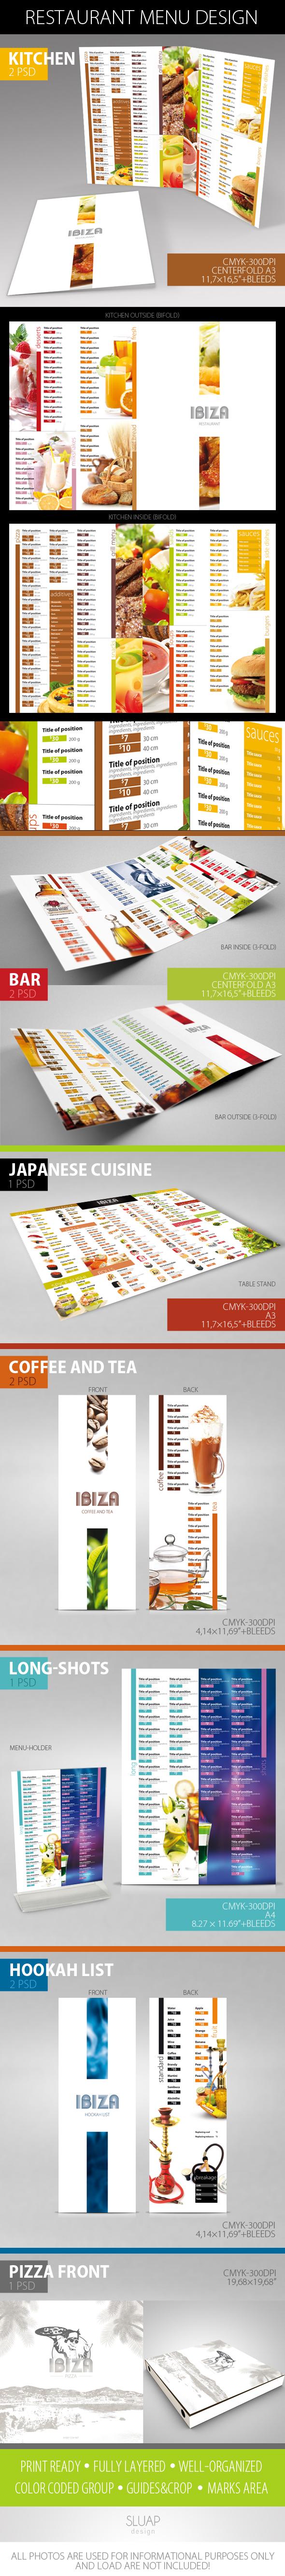 Restaurant Menu Design by sluapdesign